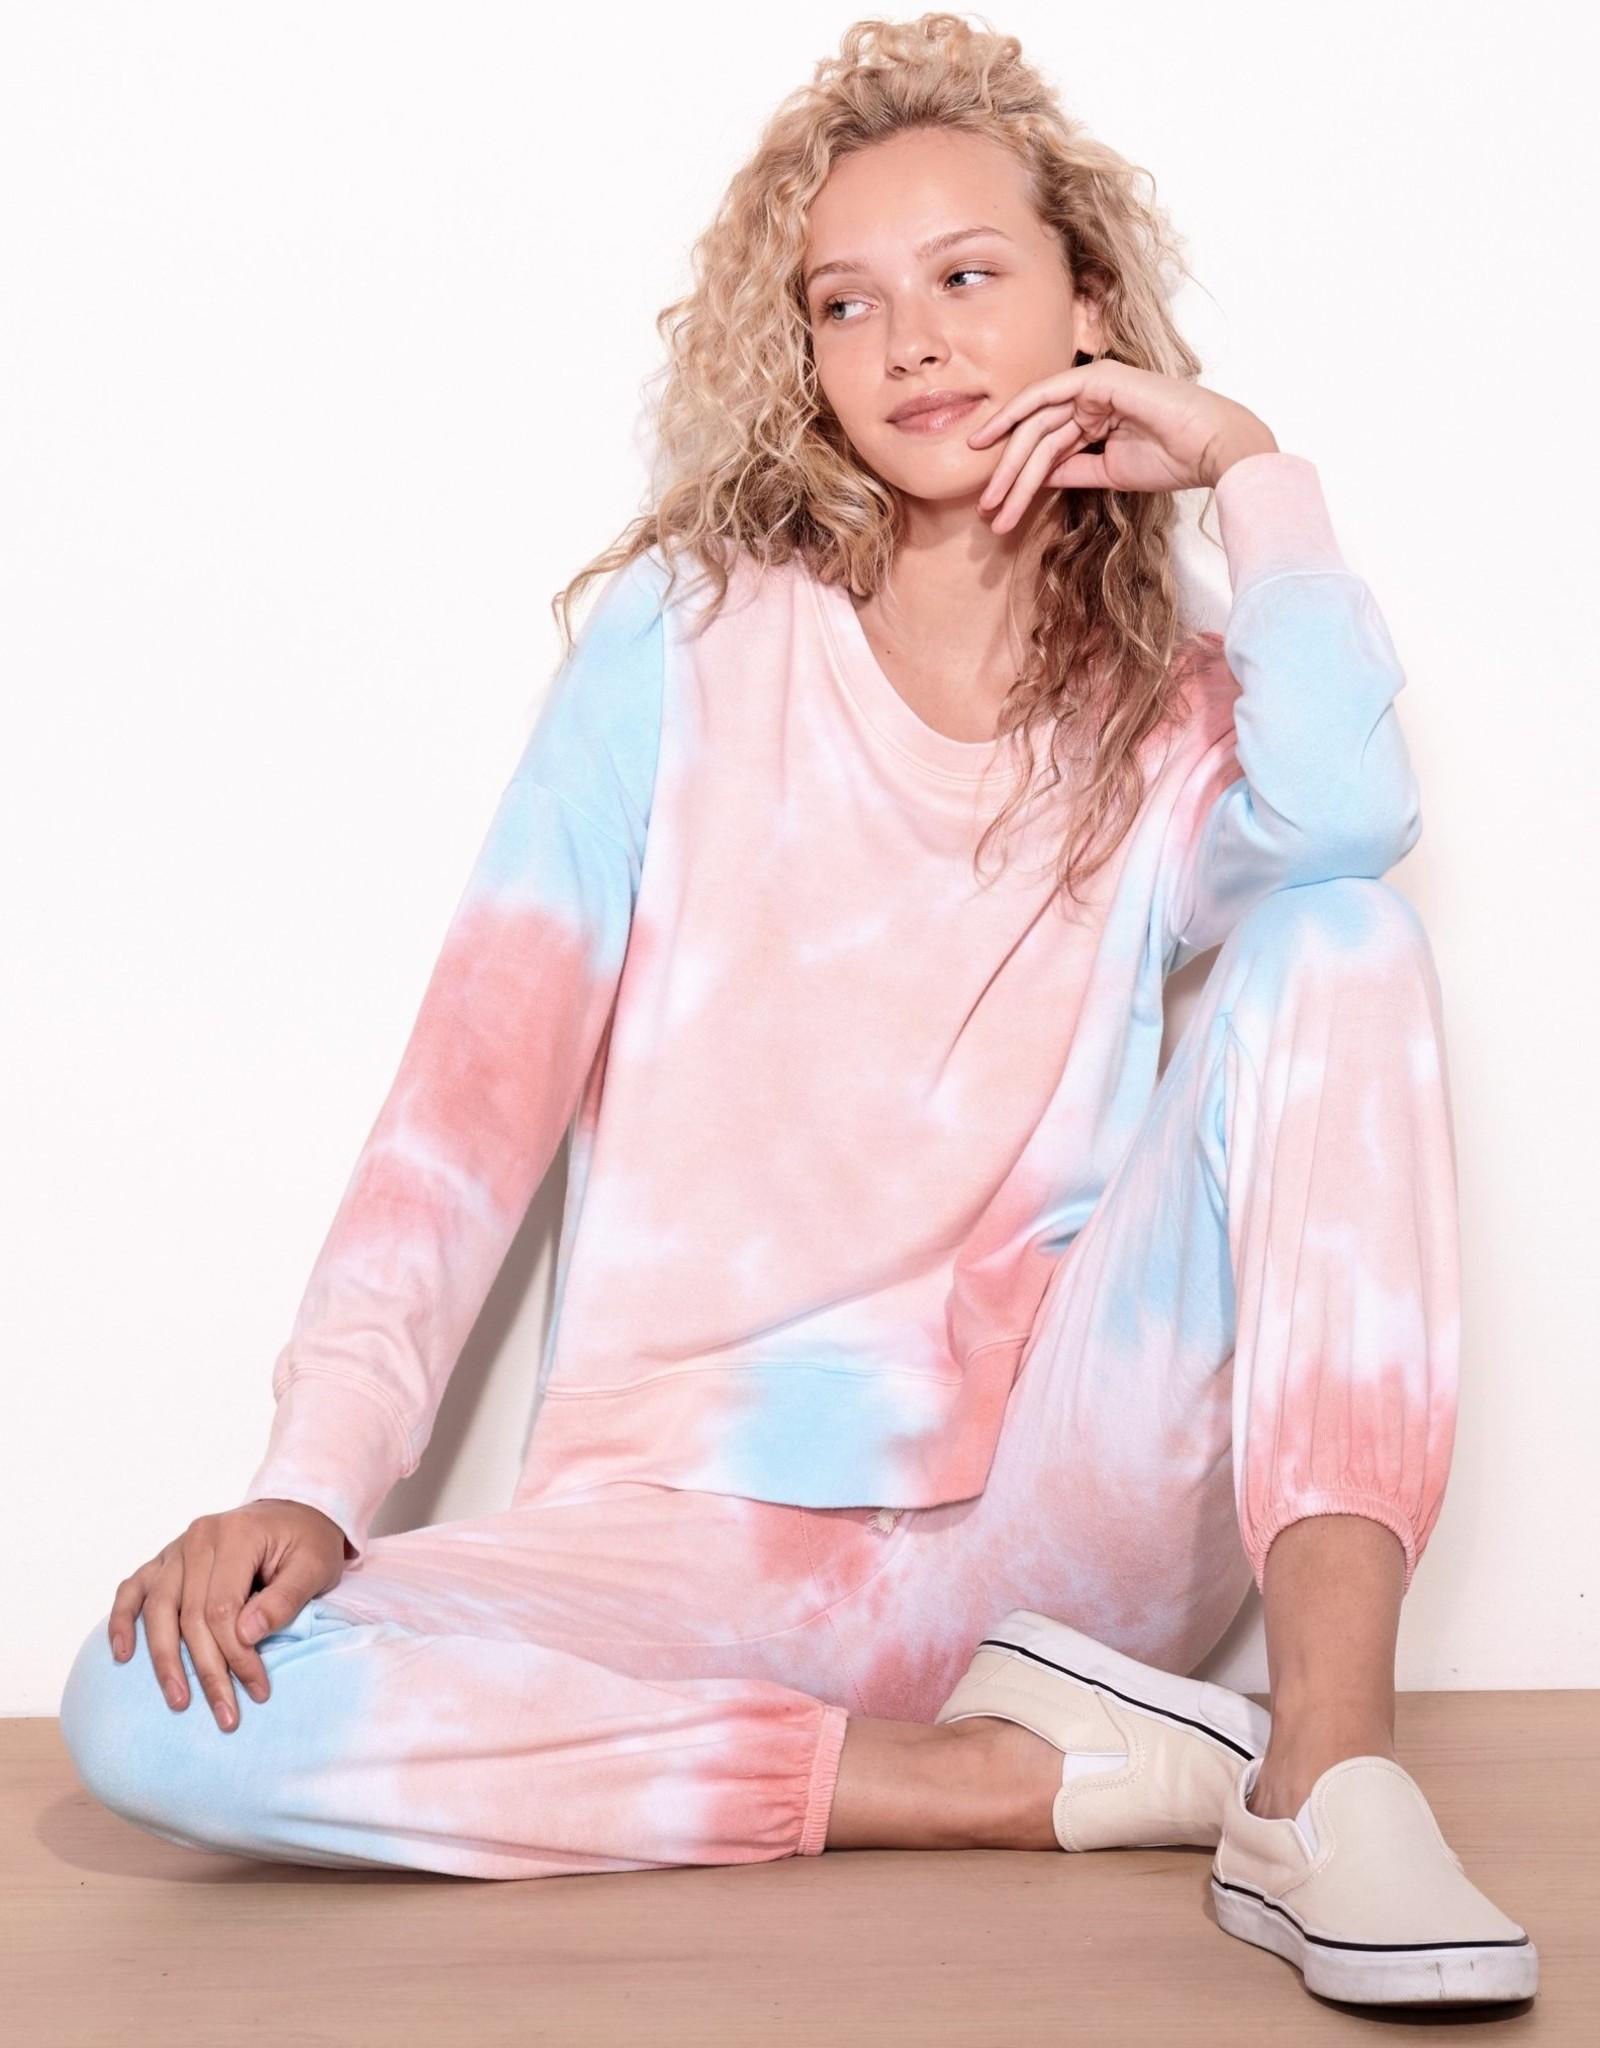 Sundry Sundry Multicolor Tie Dye Oversized Sweatshirt